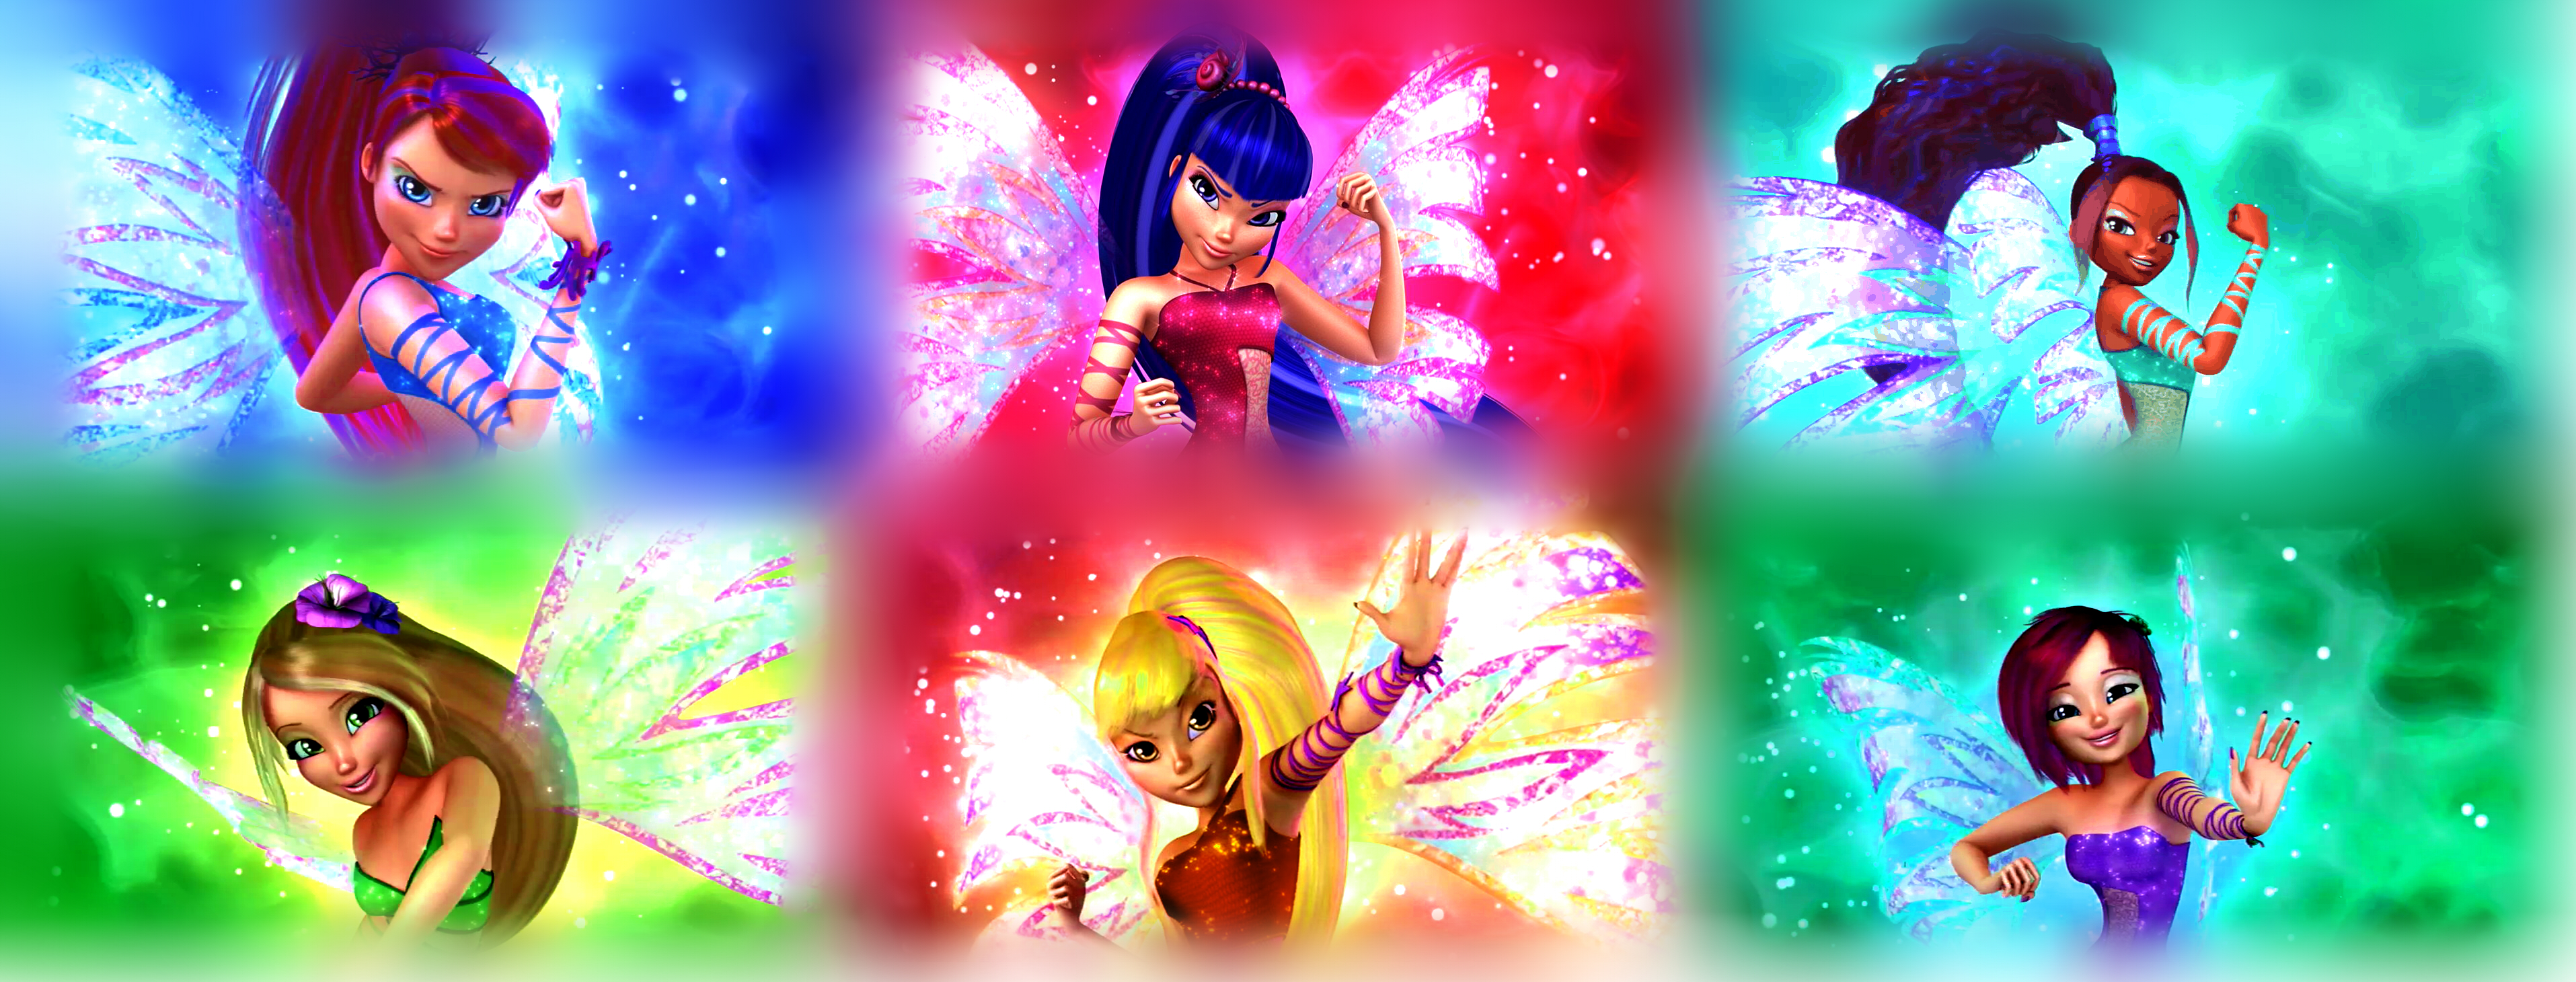 Winx Club Sirenix 3D